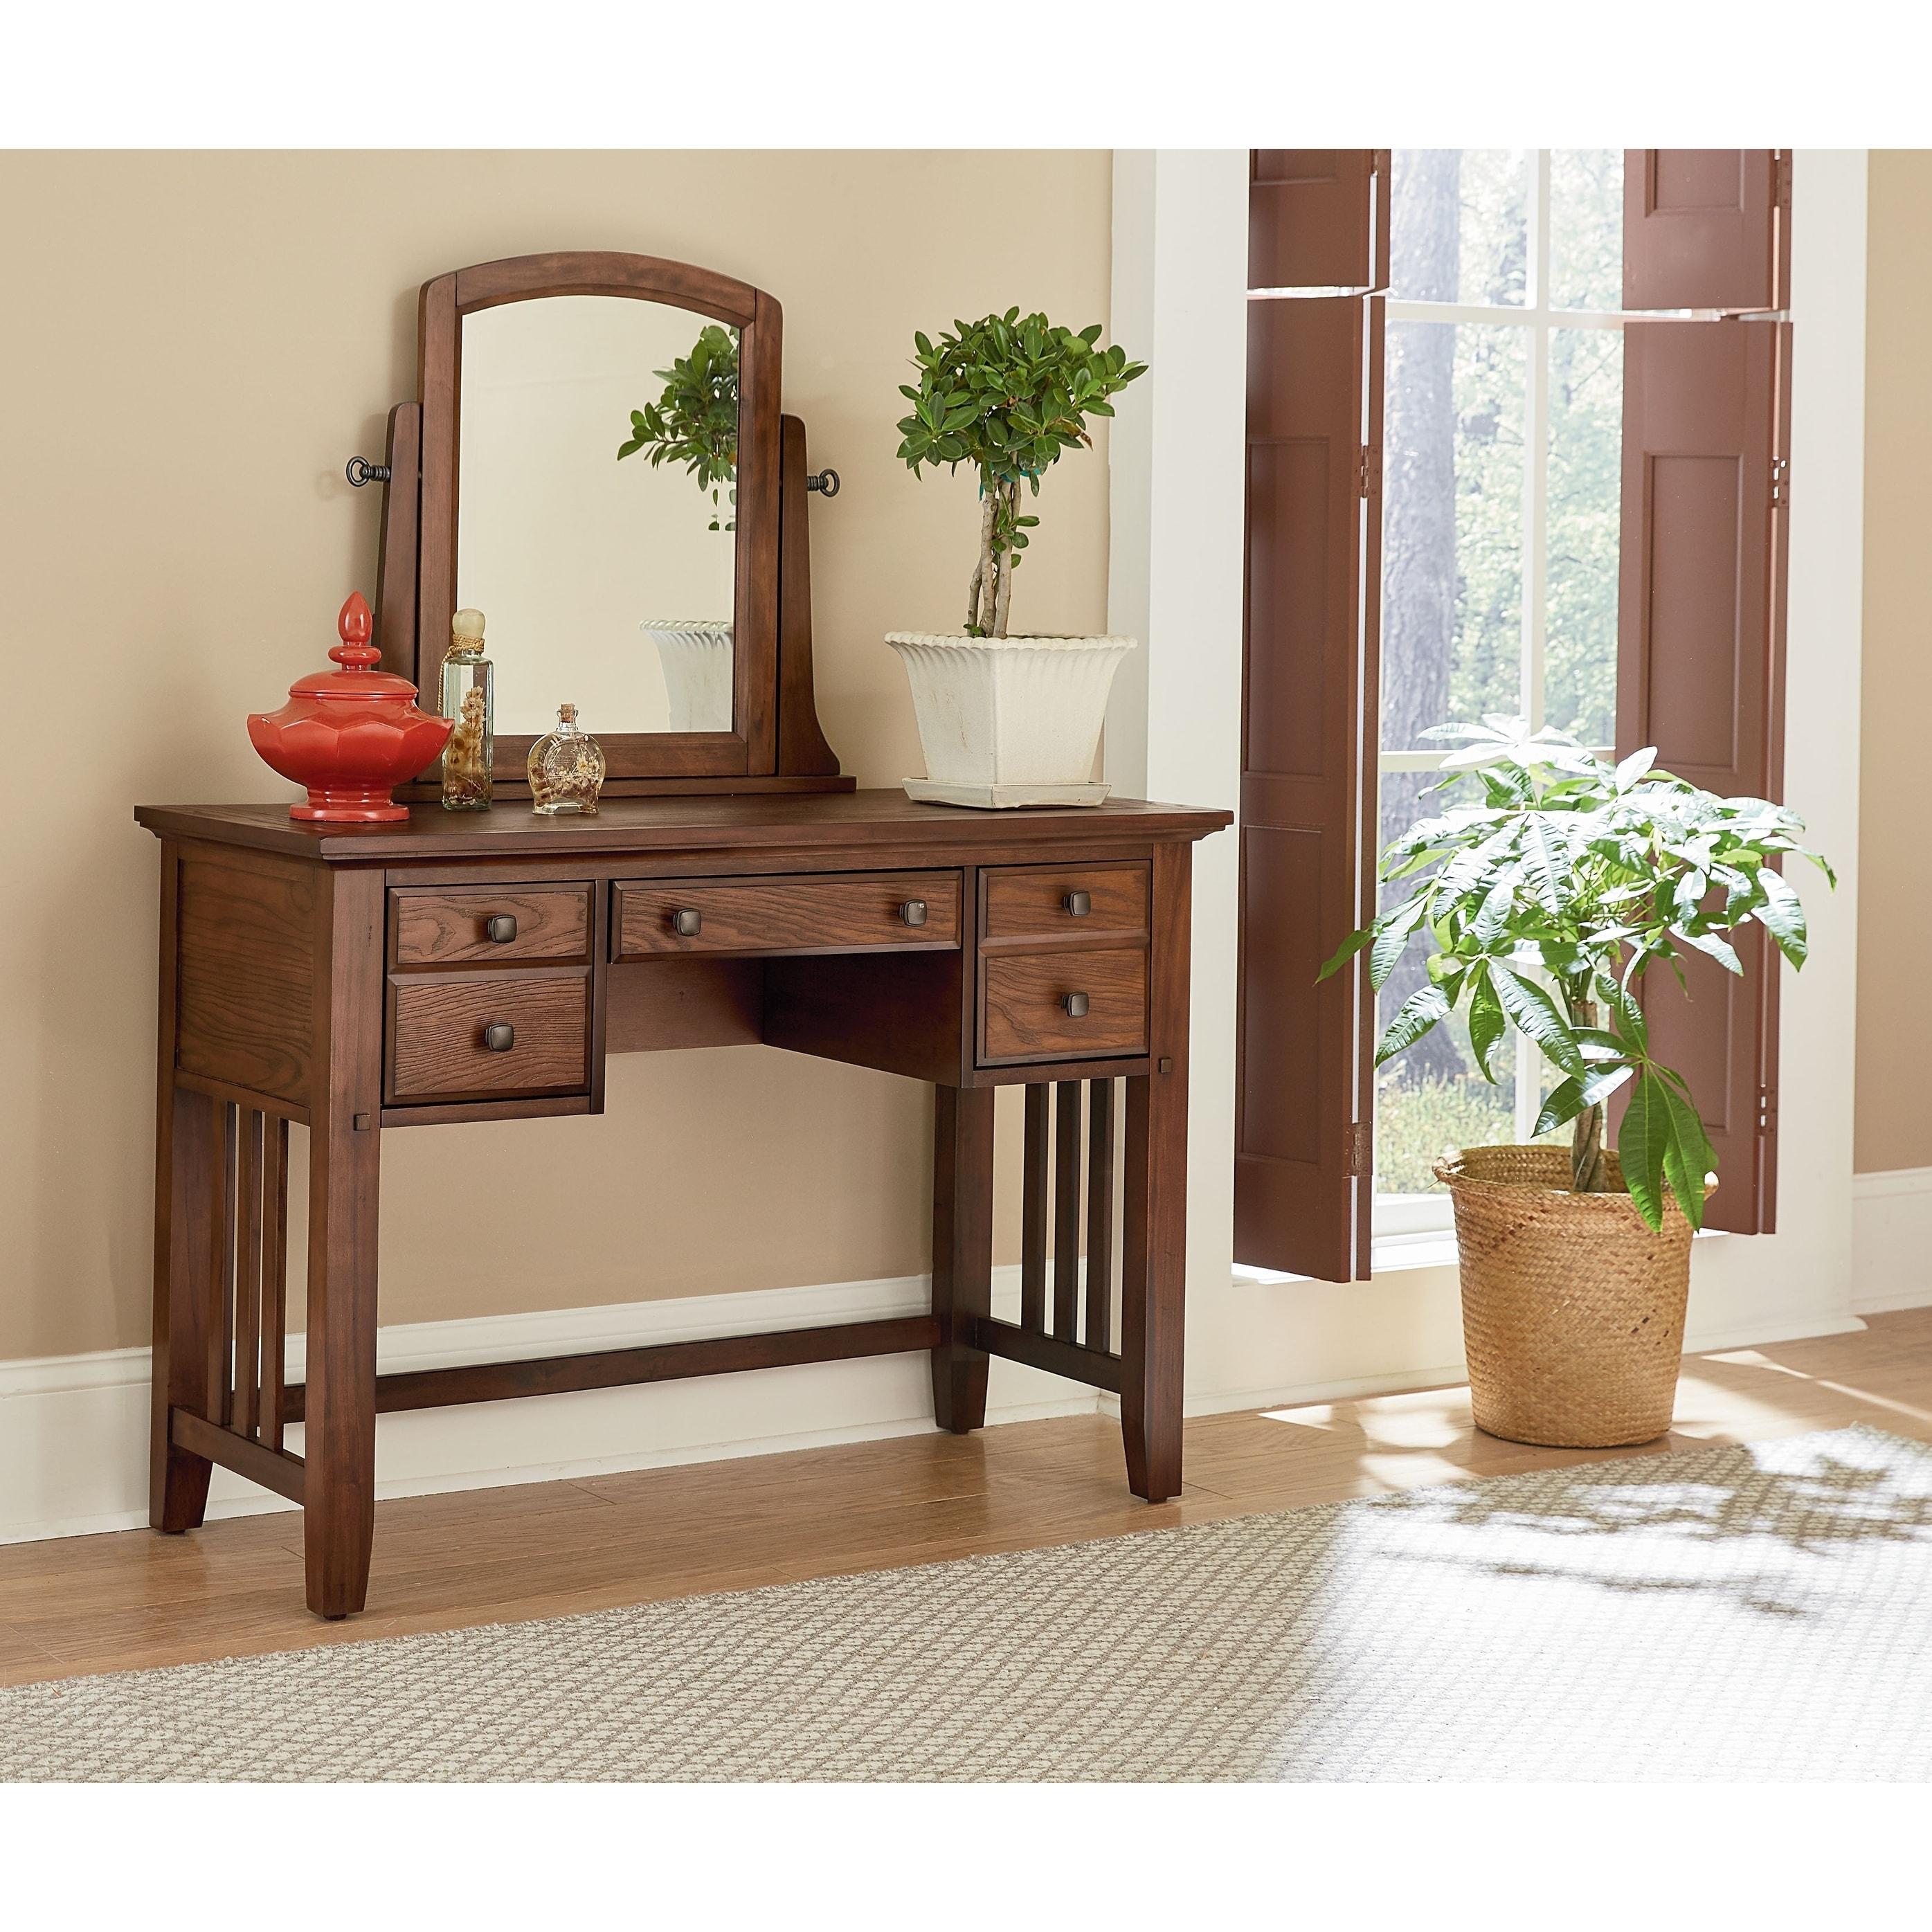 Modern Mission Bedroom Vanity and Mirror in Vintage Oak Finish